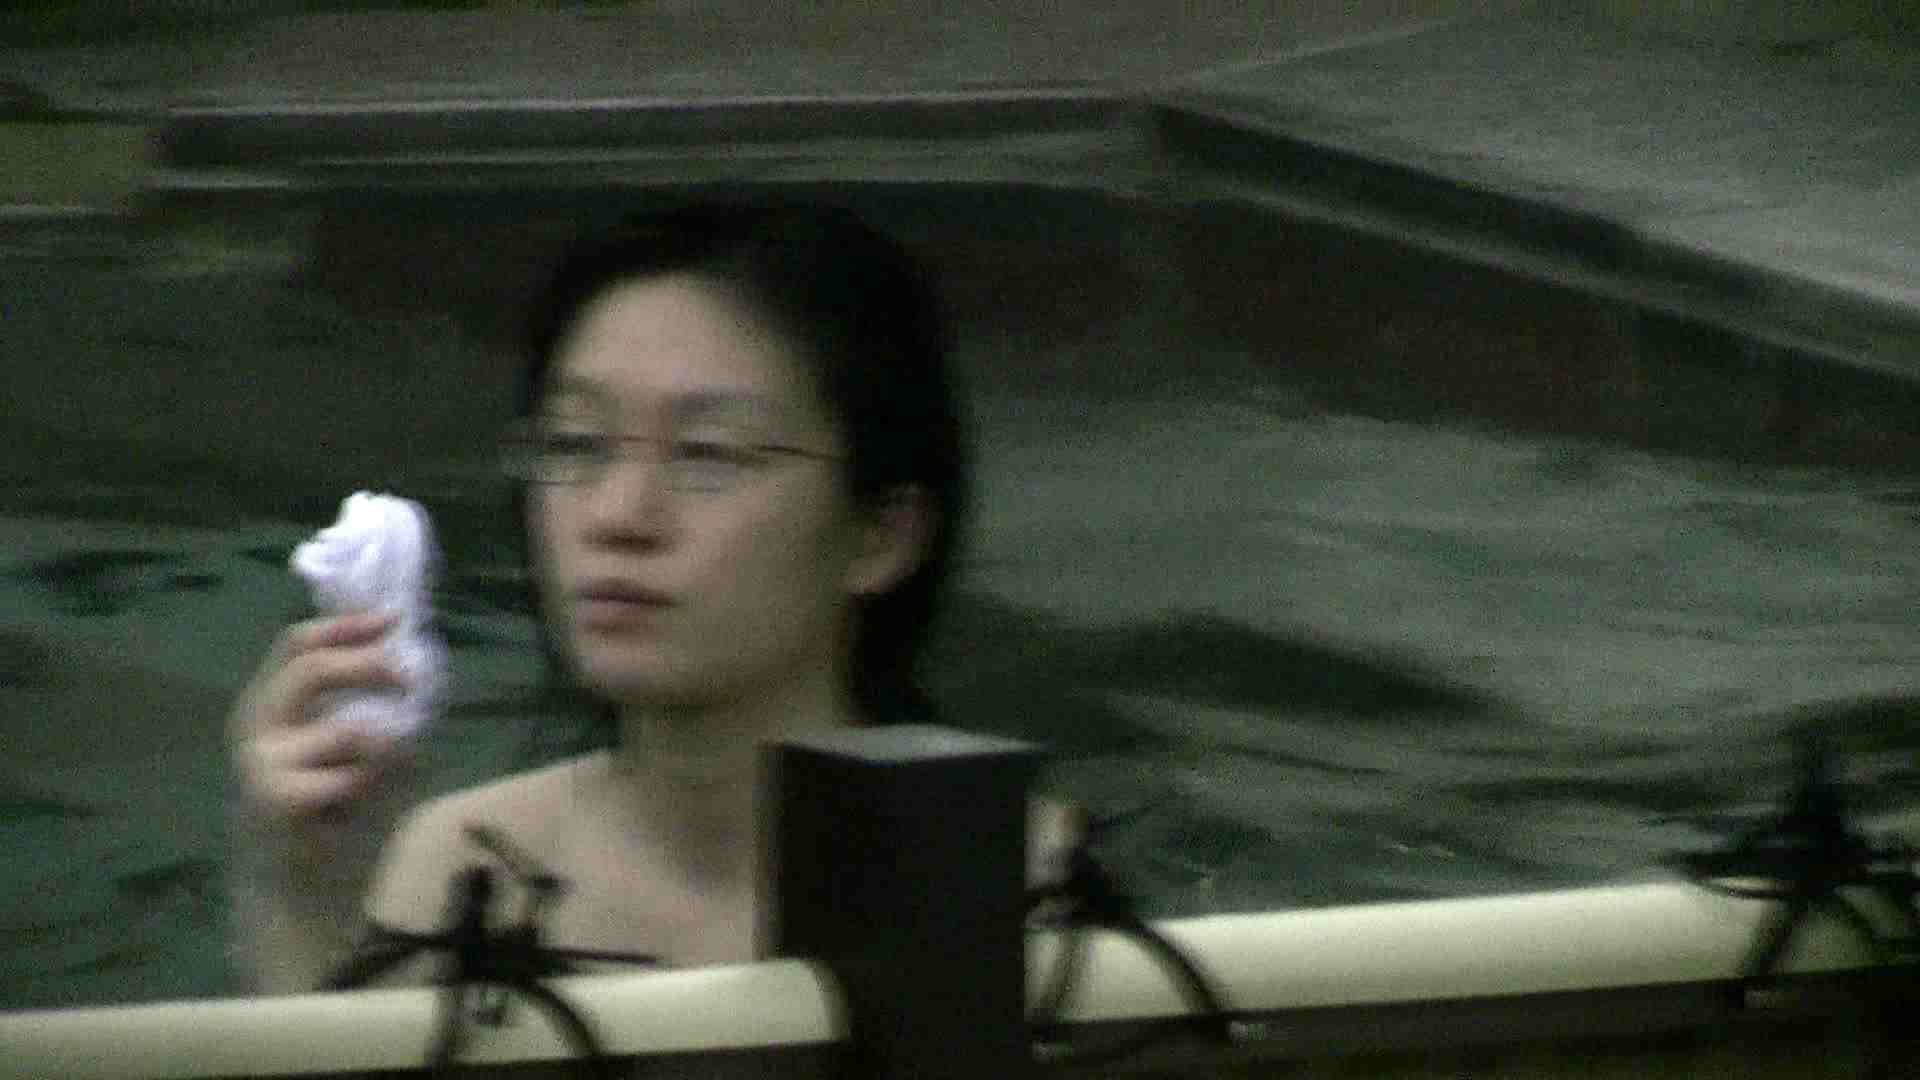 Aquaな露天風呂Vol.684 0   エッチな盗撮  87pic 33